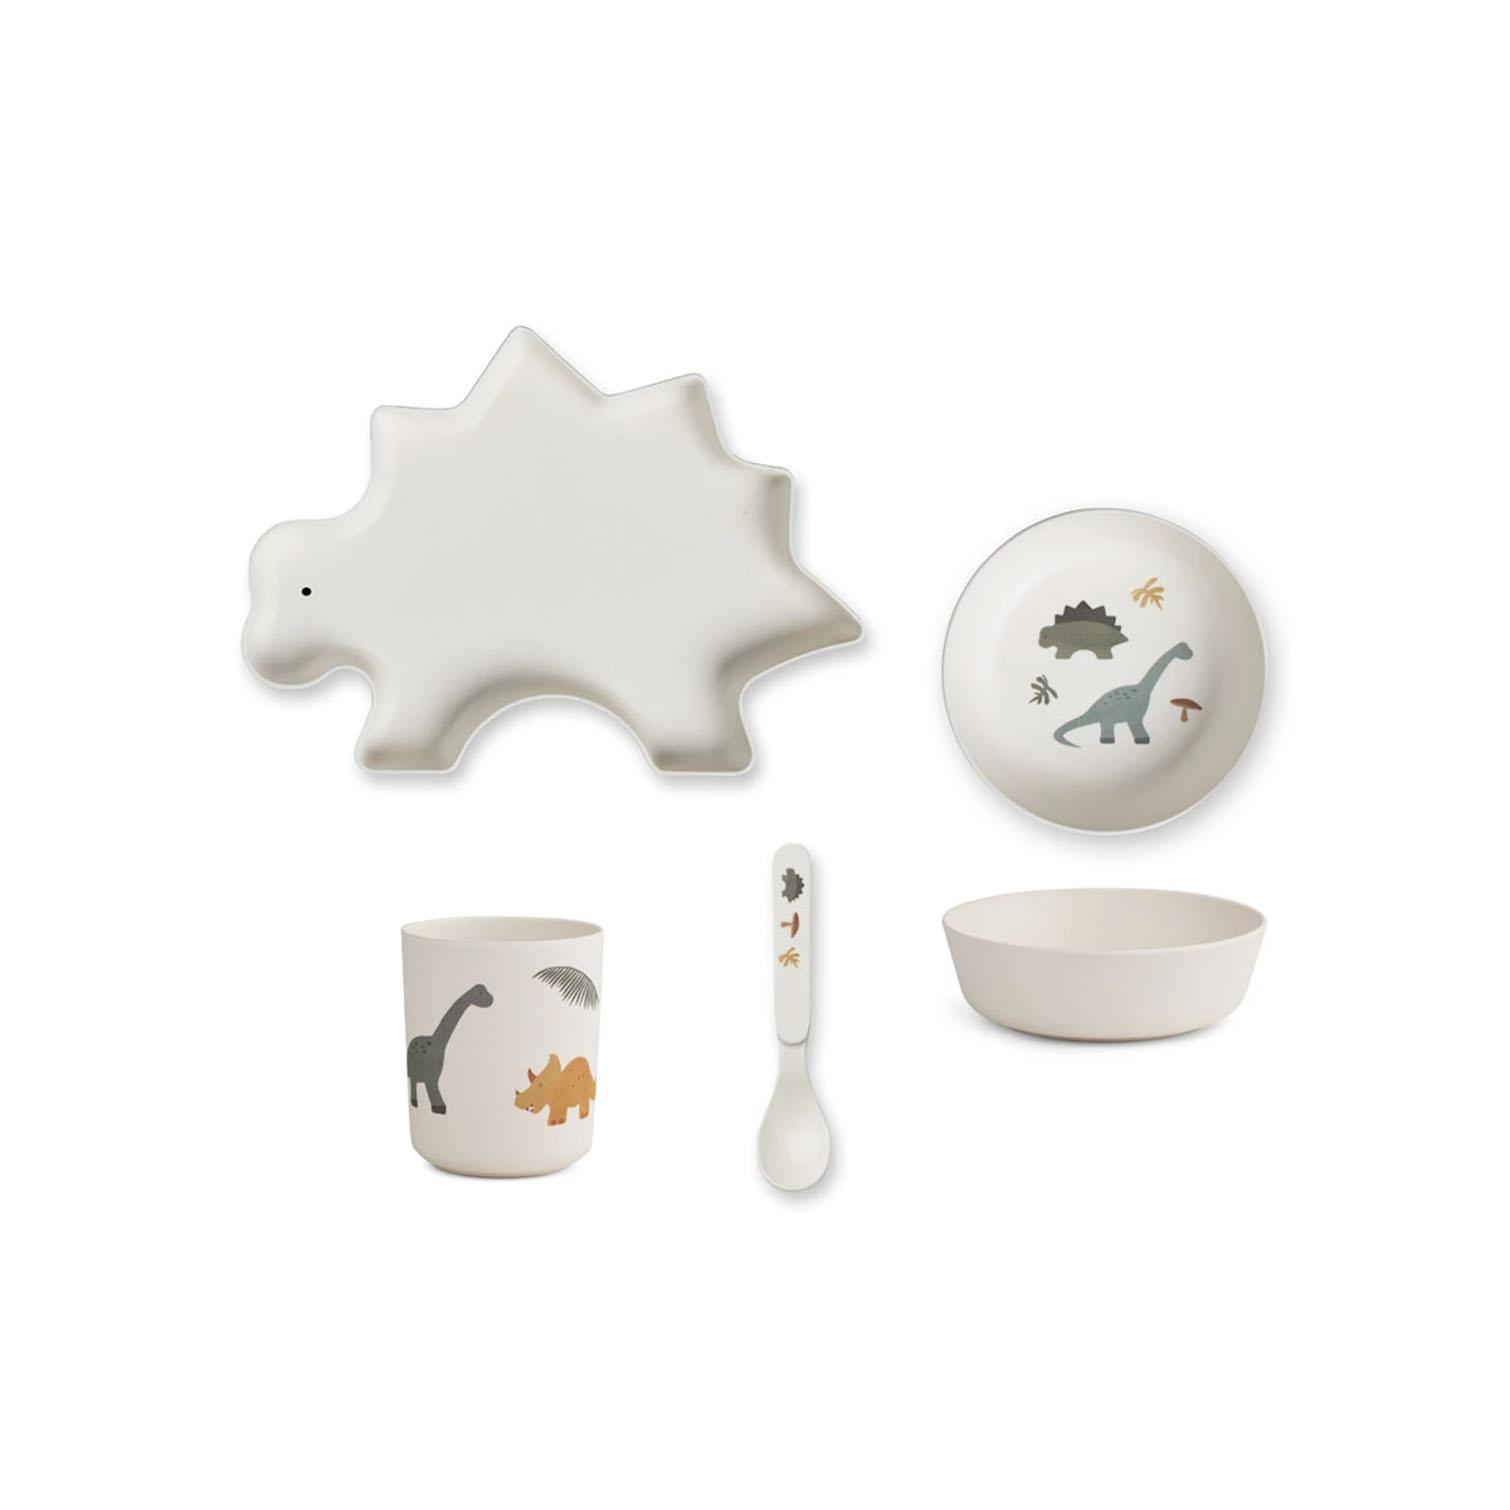 liewood //恐竜バンブー食器セット(ホワイト)